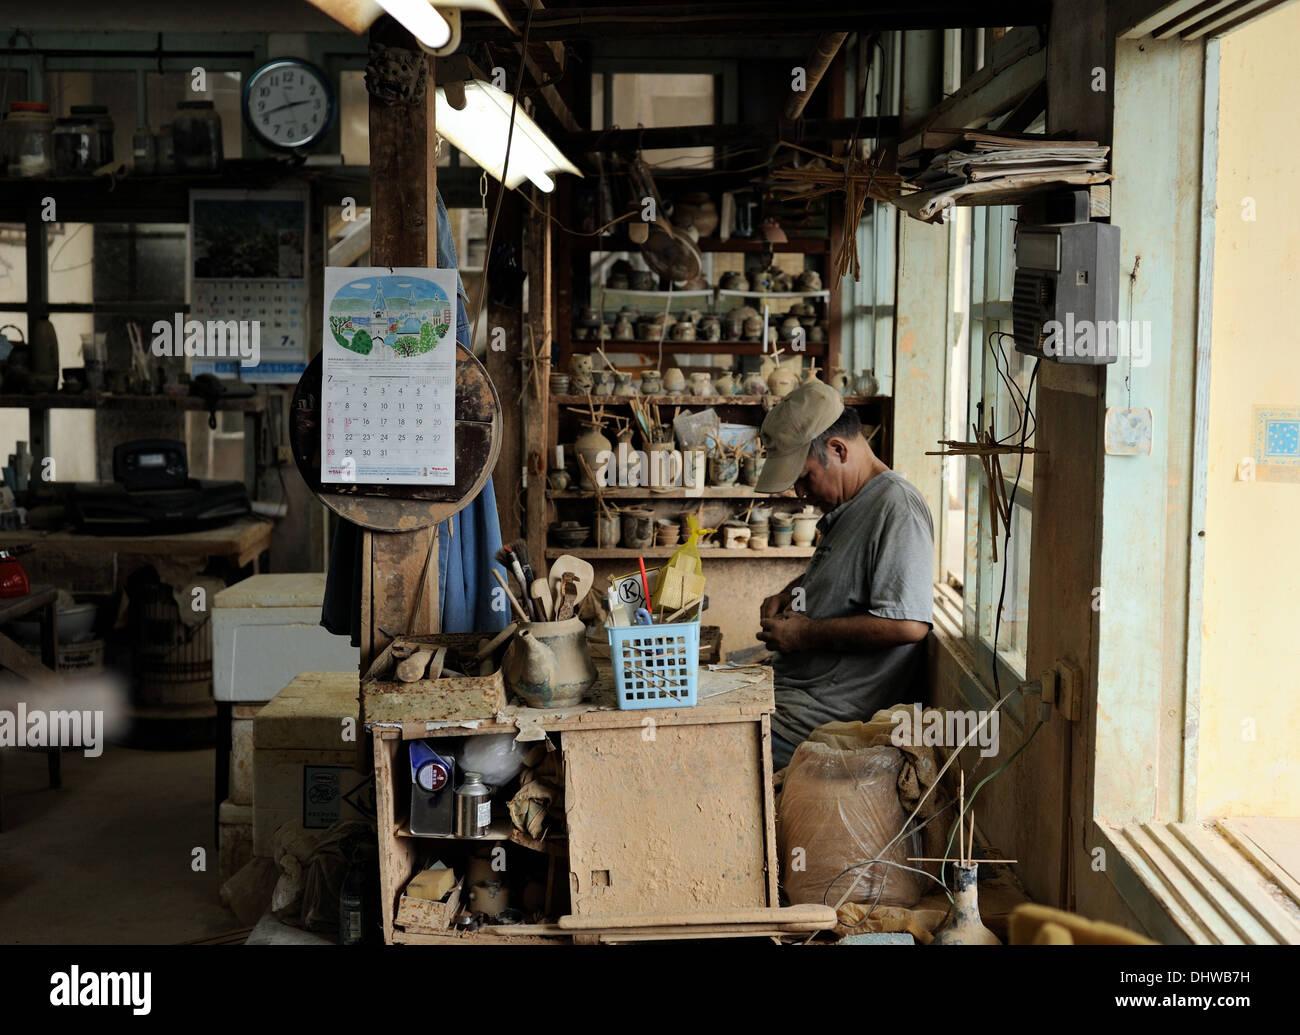 Tsuboya Pottery craftsman hard at work in Naha City, Okinawa - Stock Image